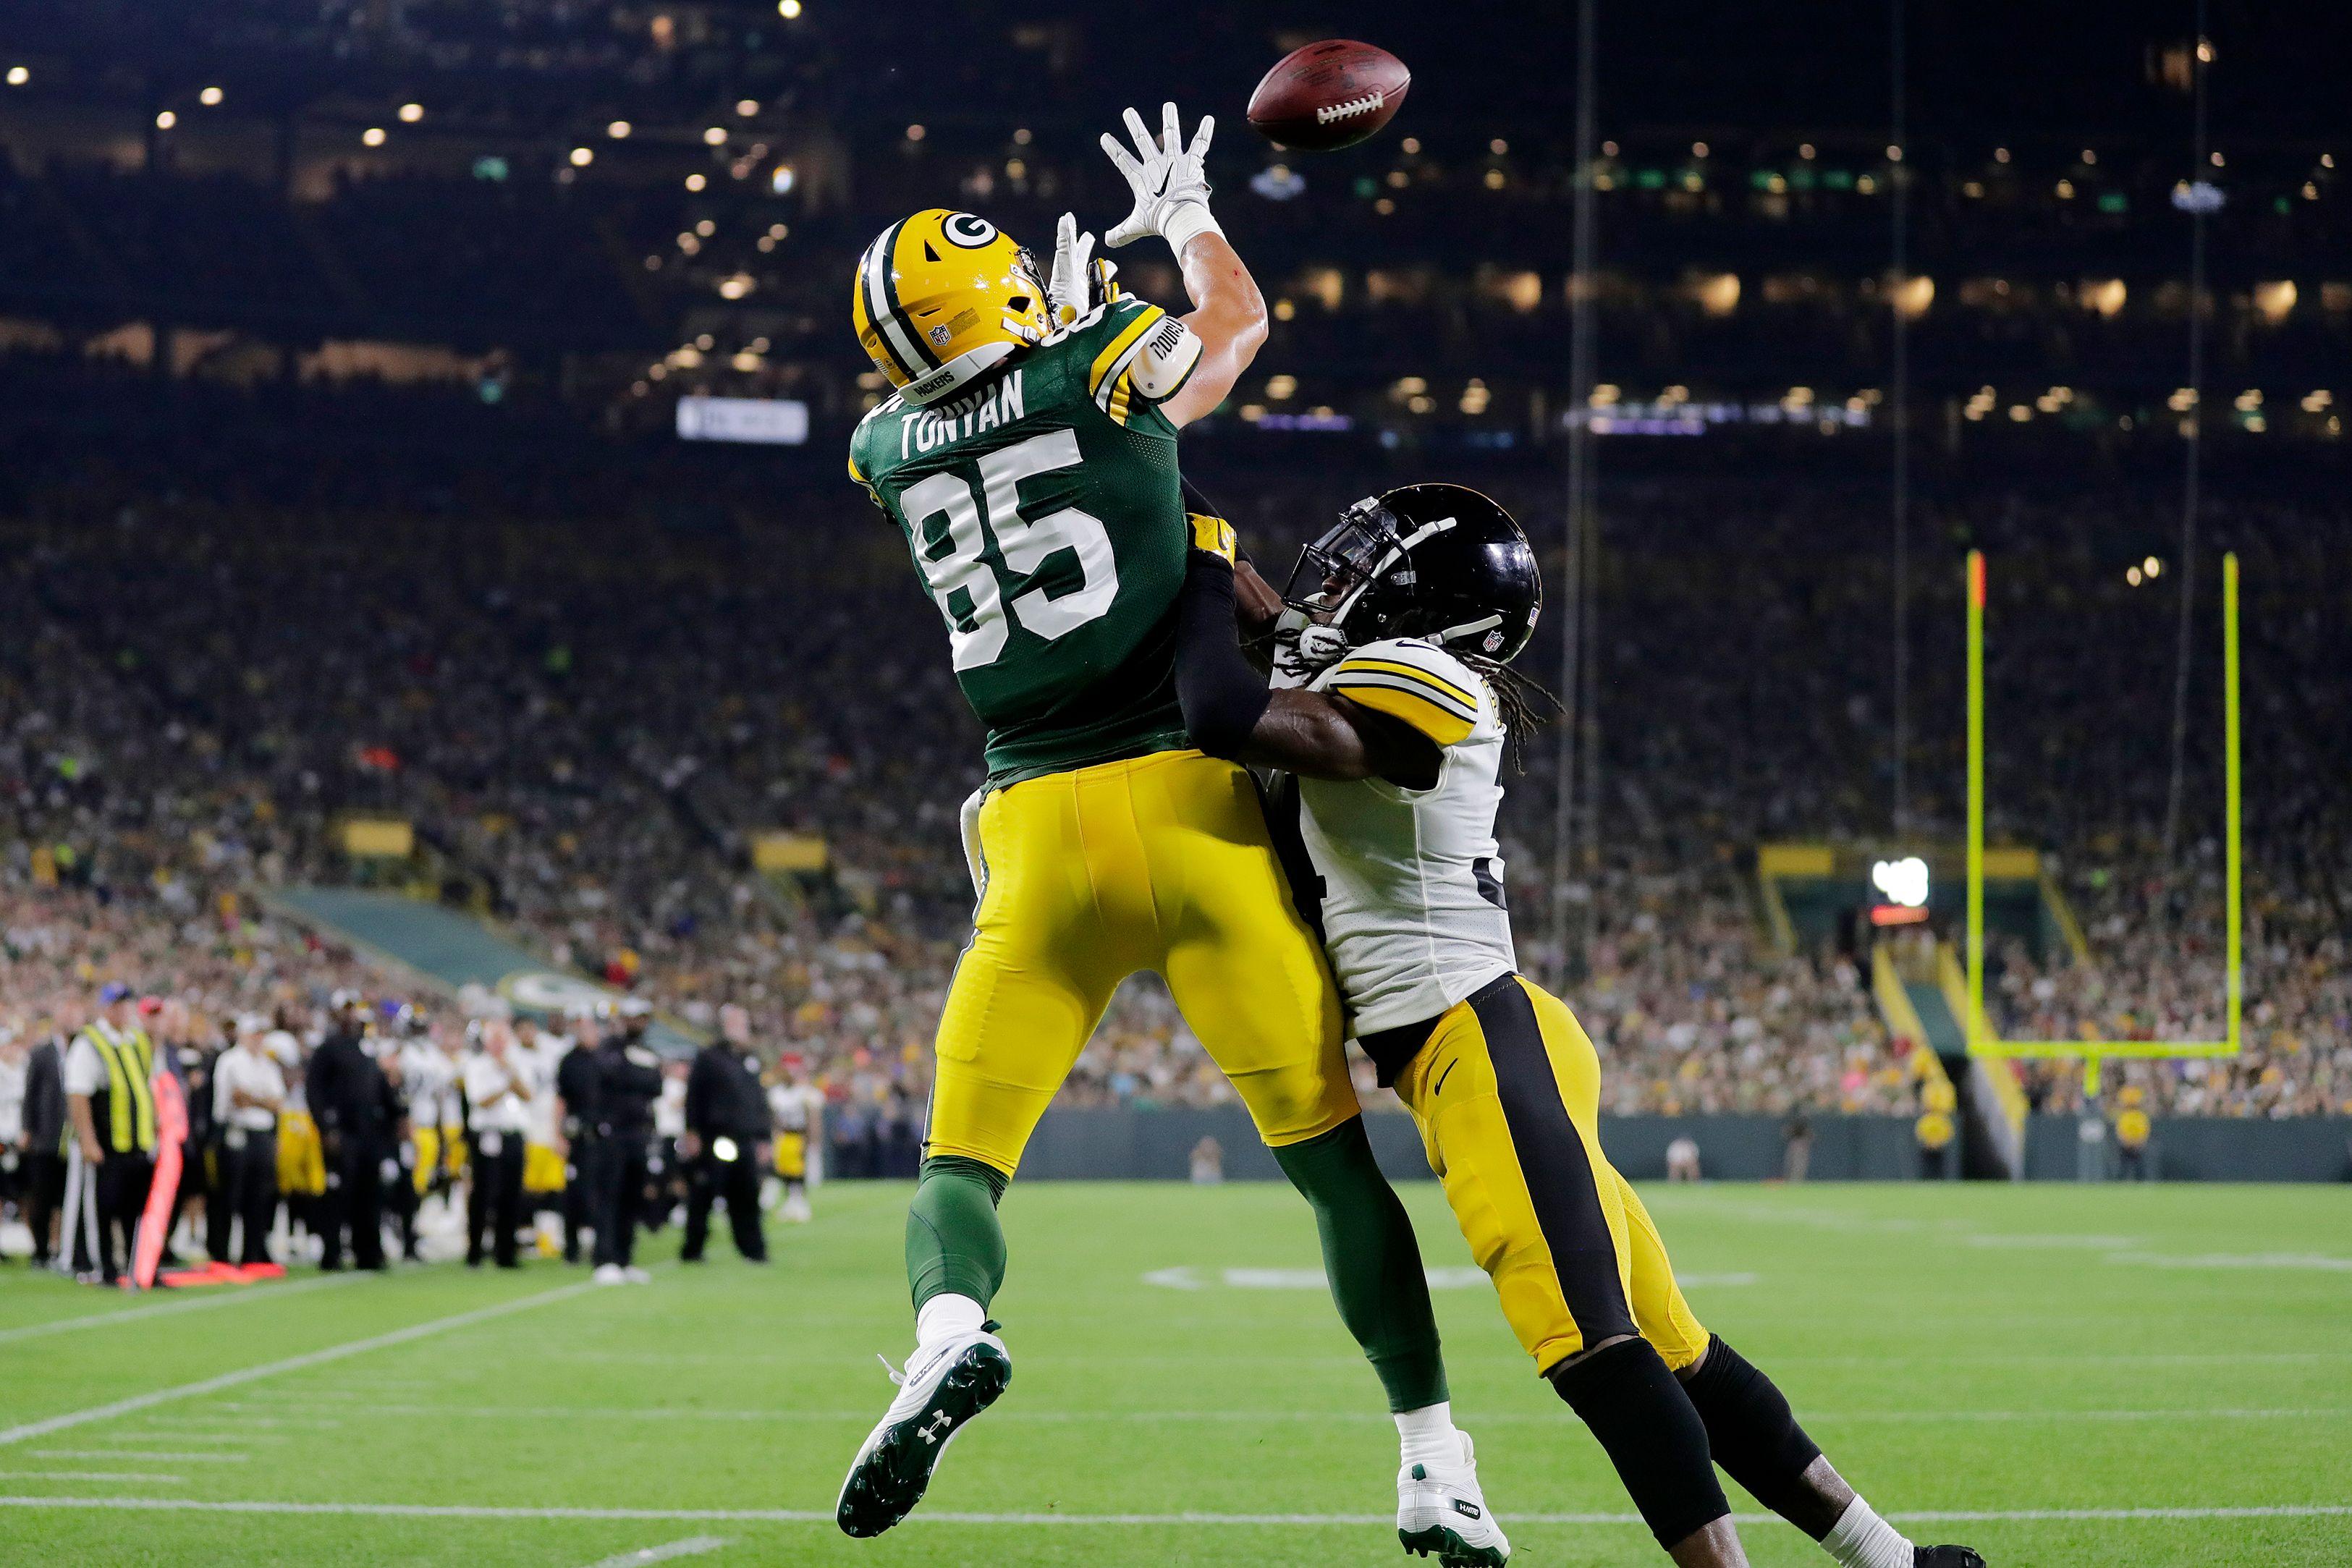 Six Key Factors That Will Determine the Winner of the Packers-Steelers in Week 4